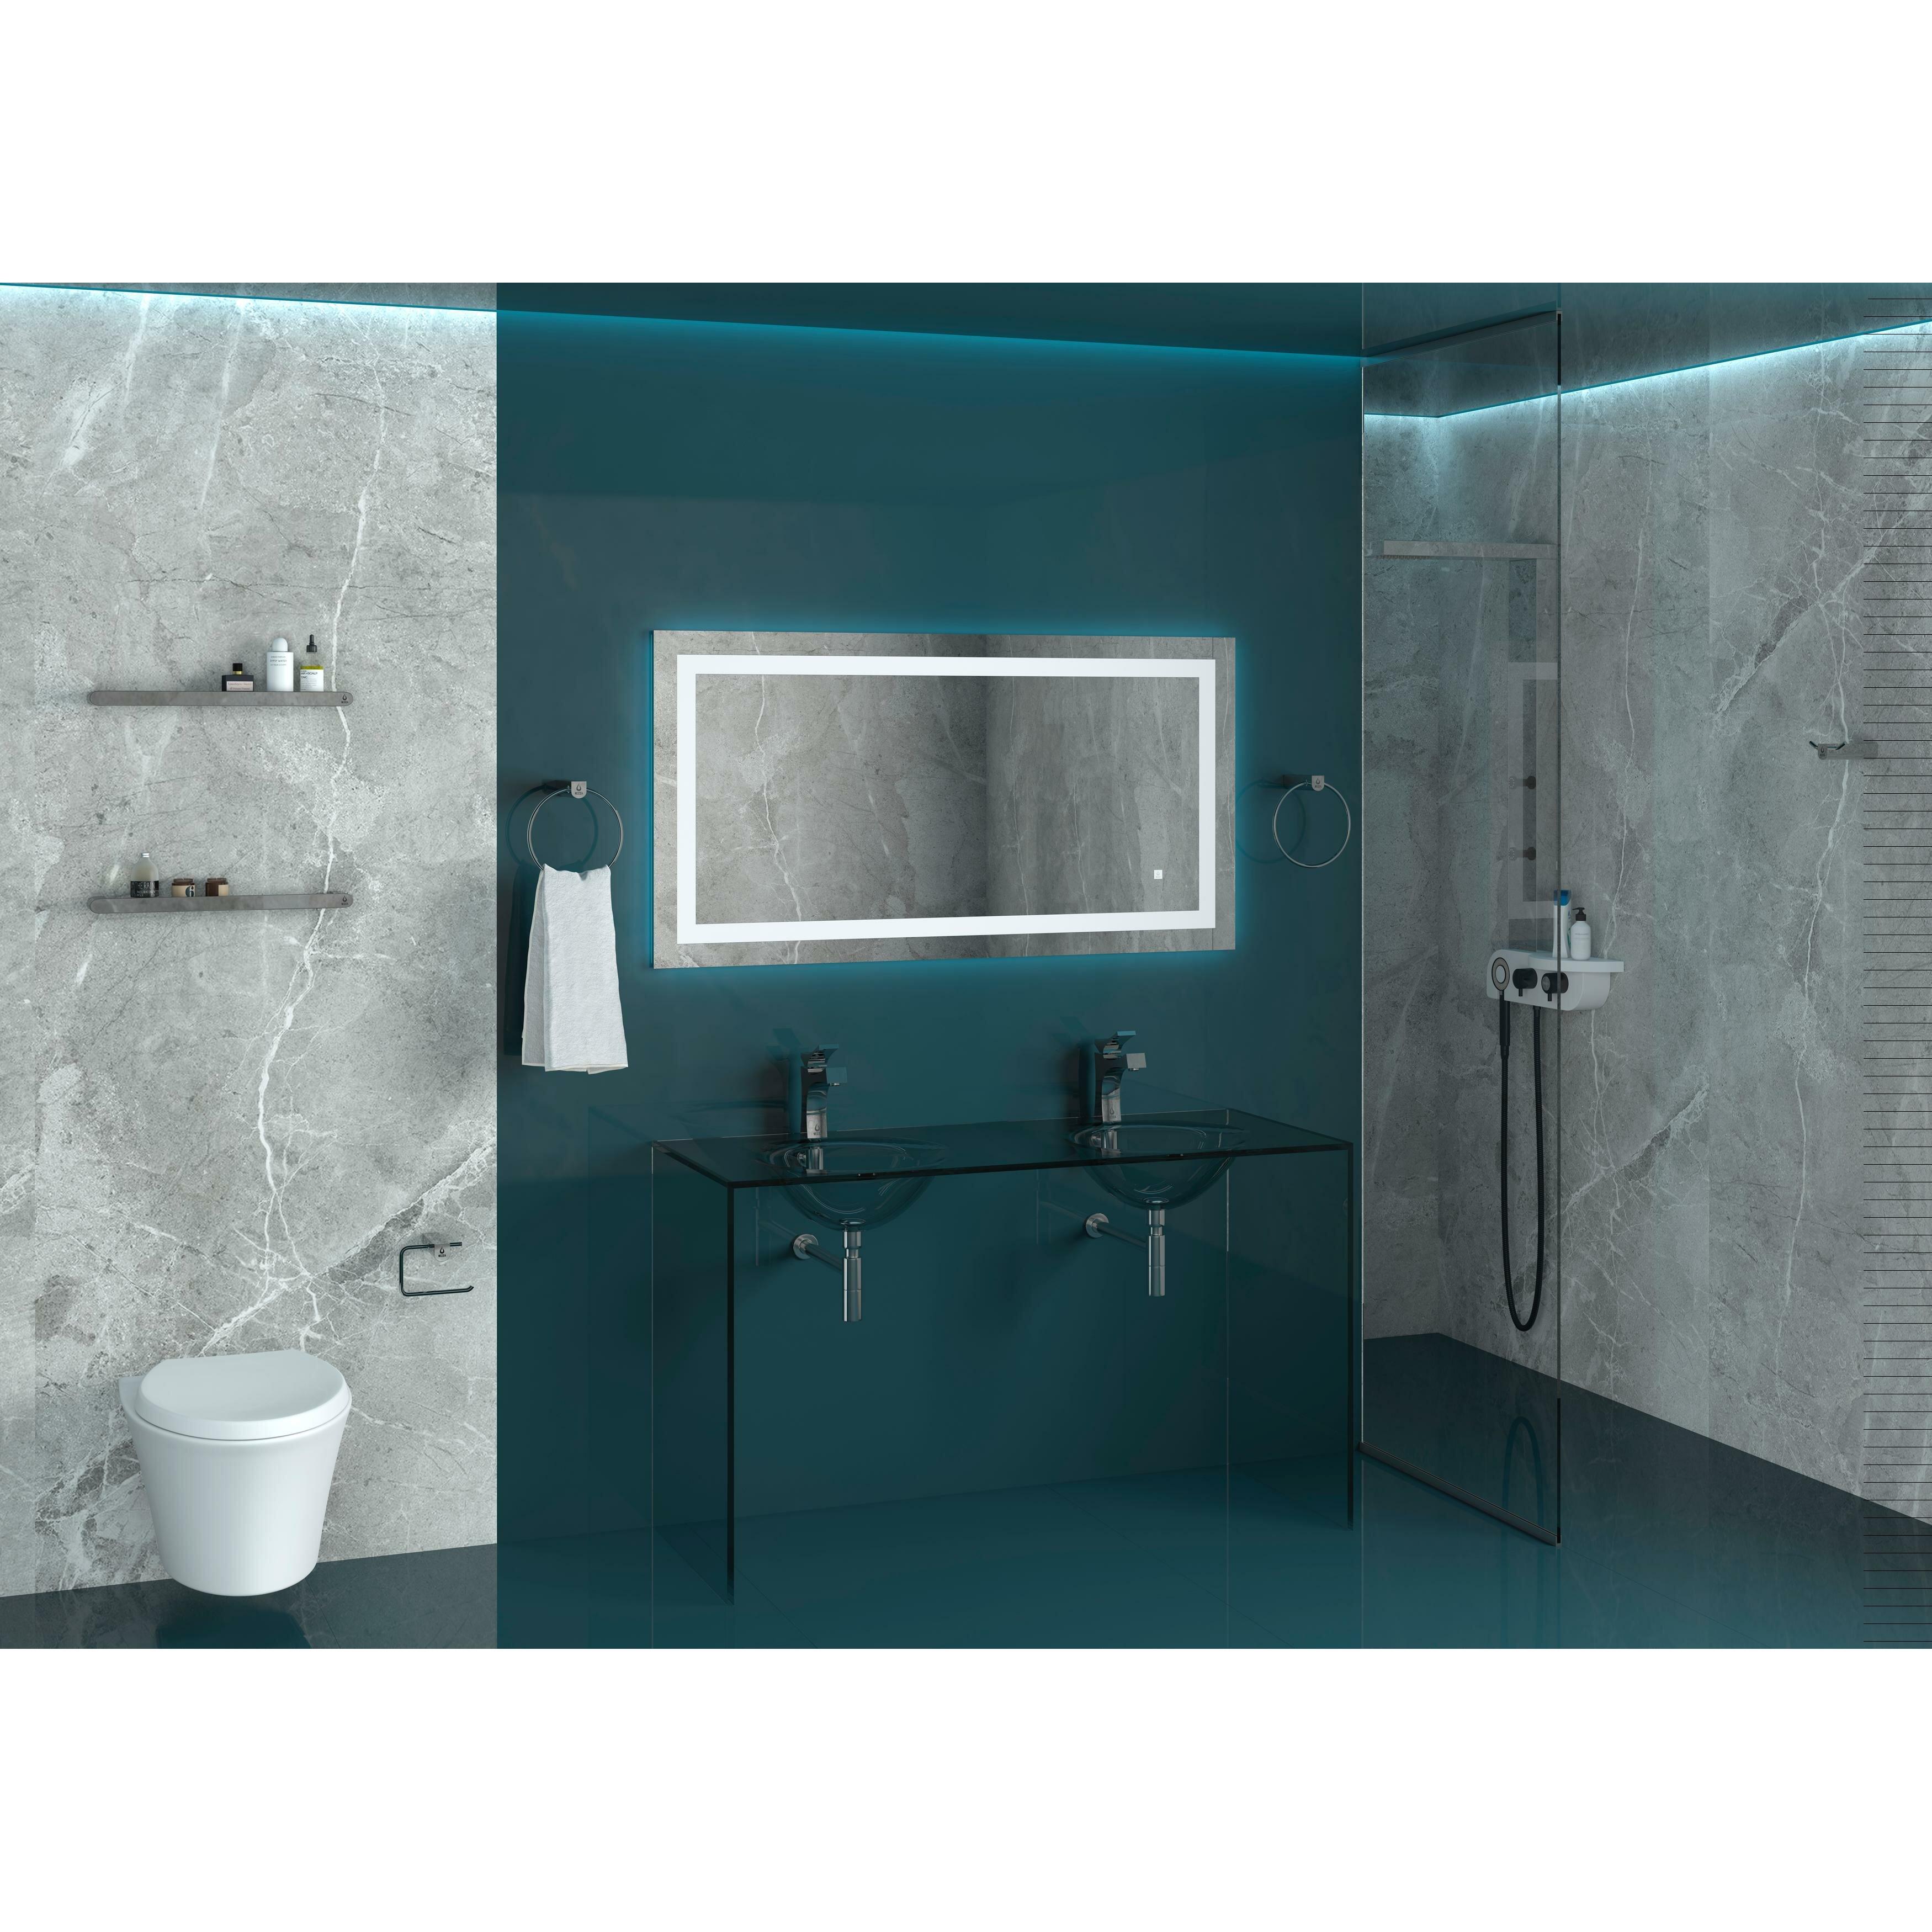 Nezza 5 piece bathroom hardware set wayfair for Bathroom 5 piece set